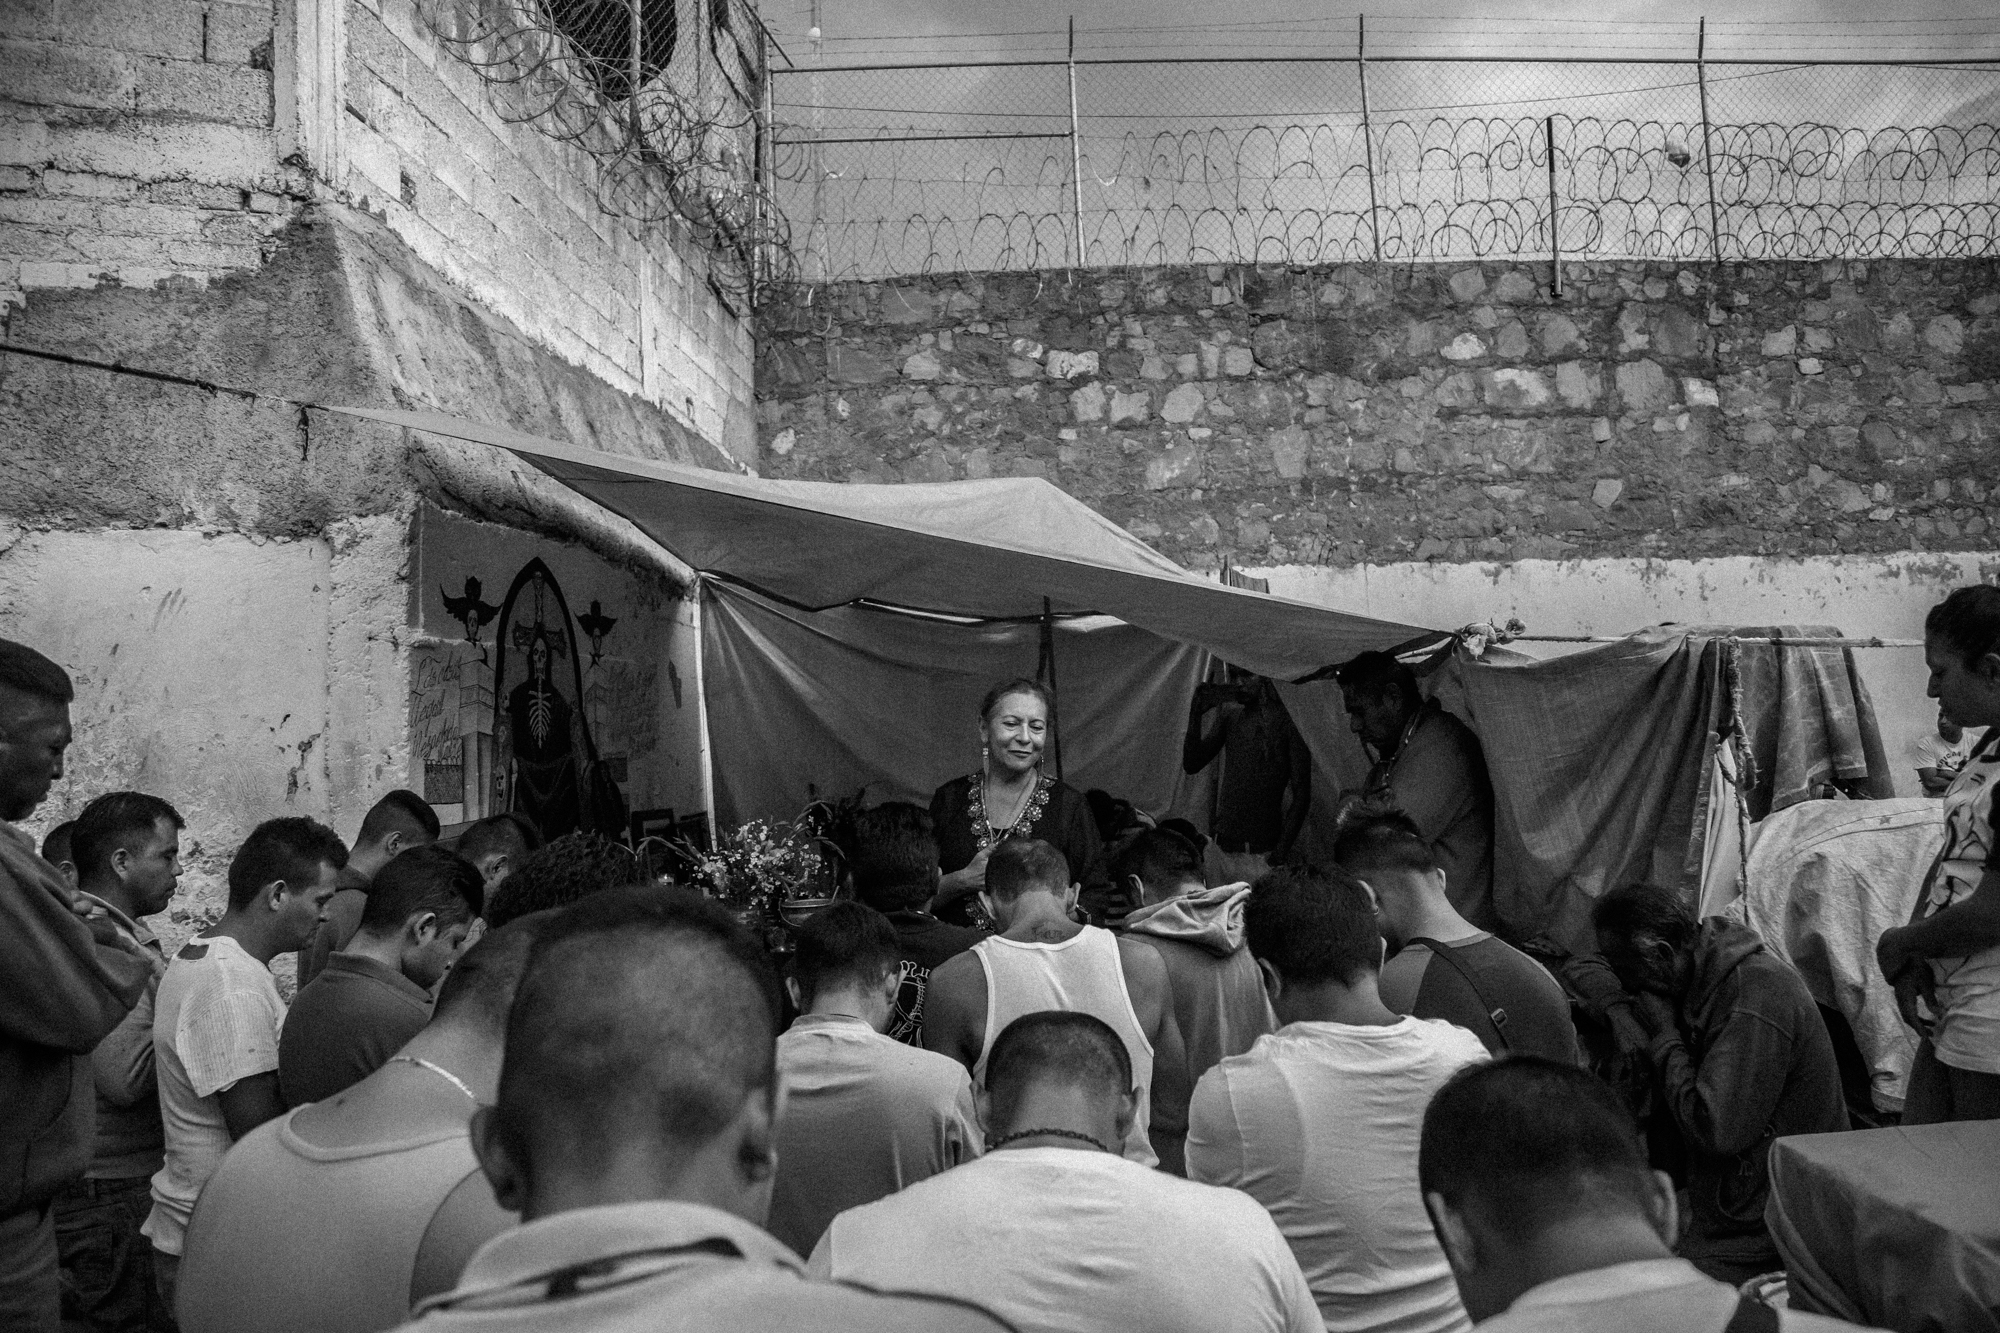 Prison-Santa_Muerte-6.jpg